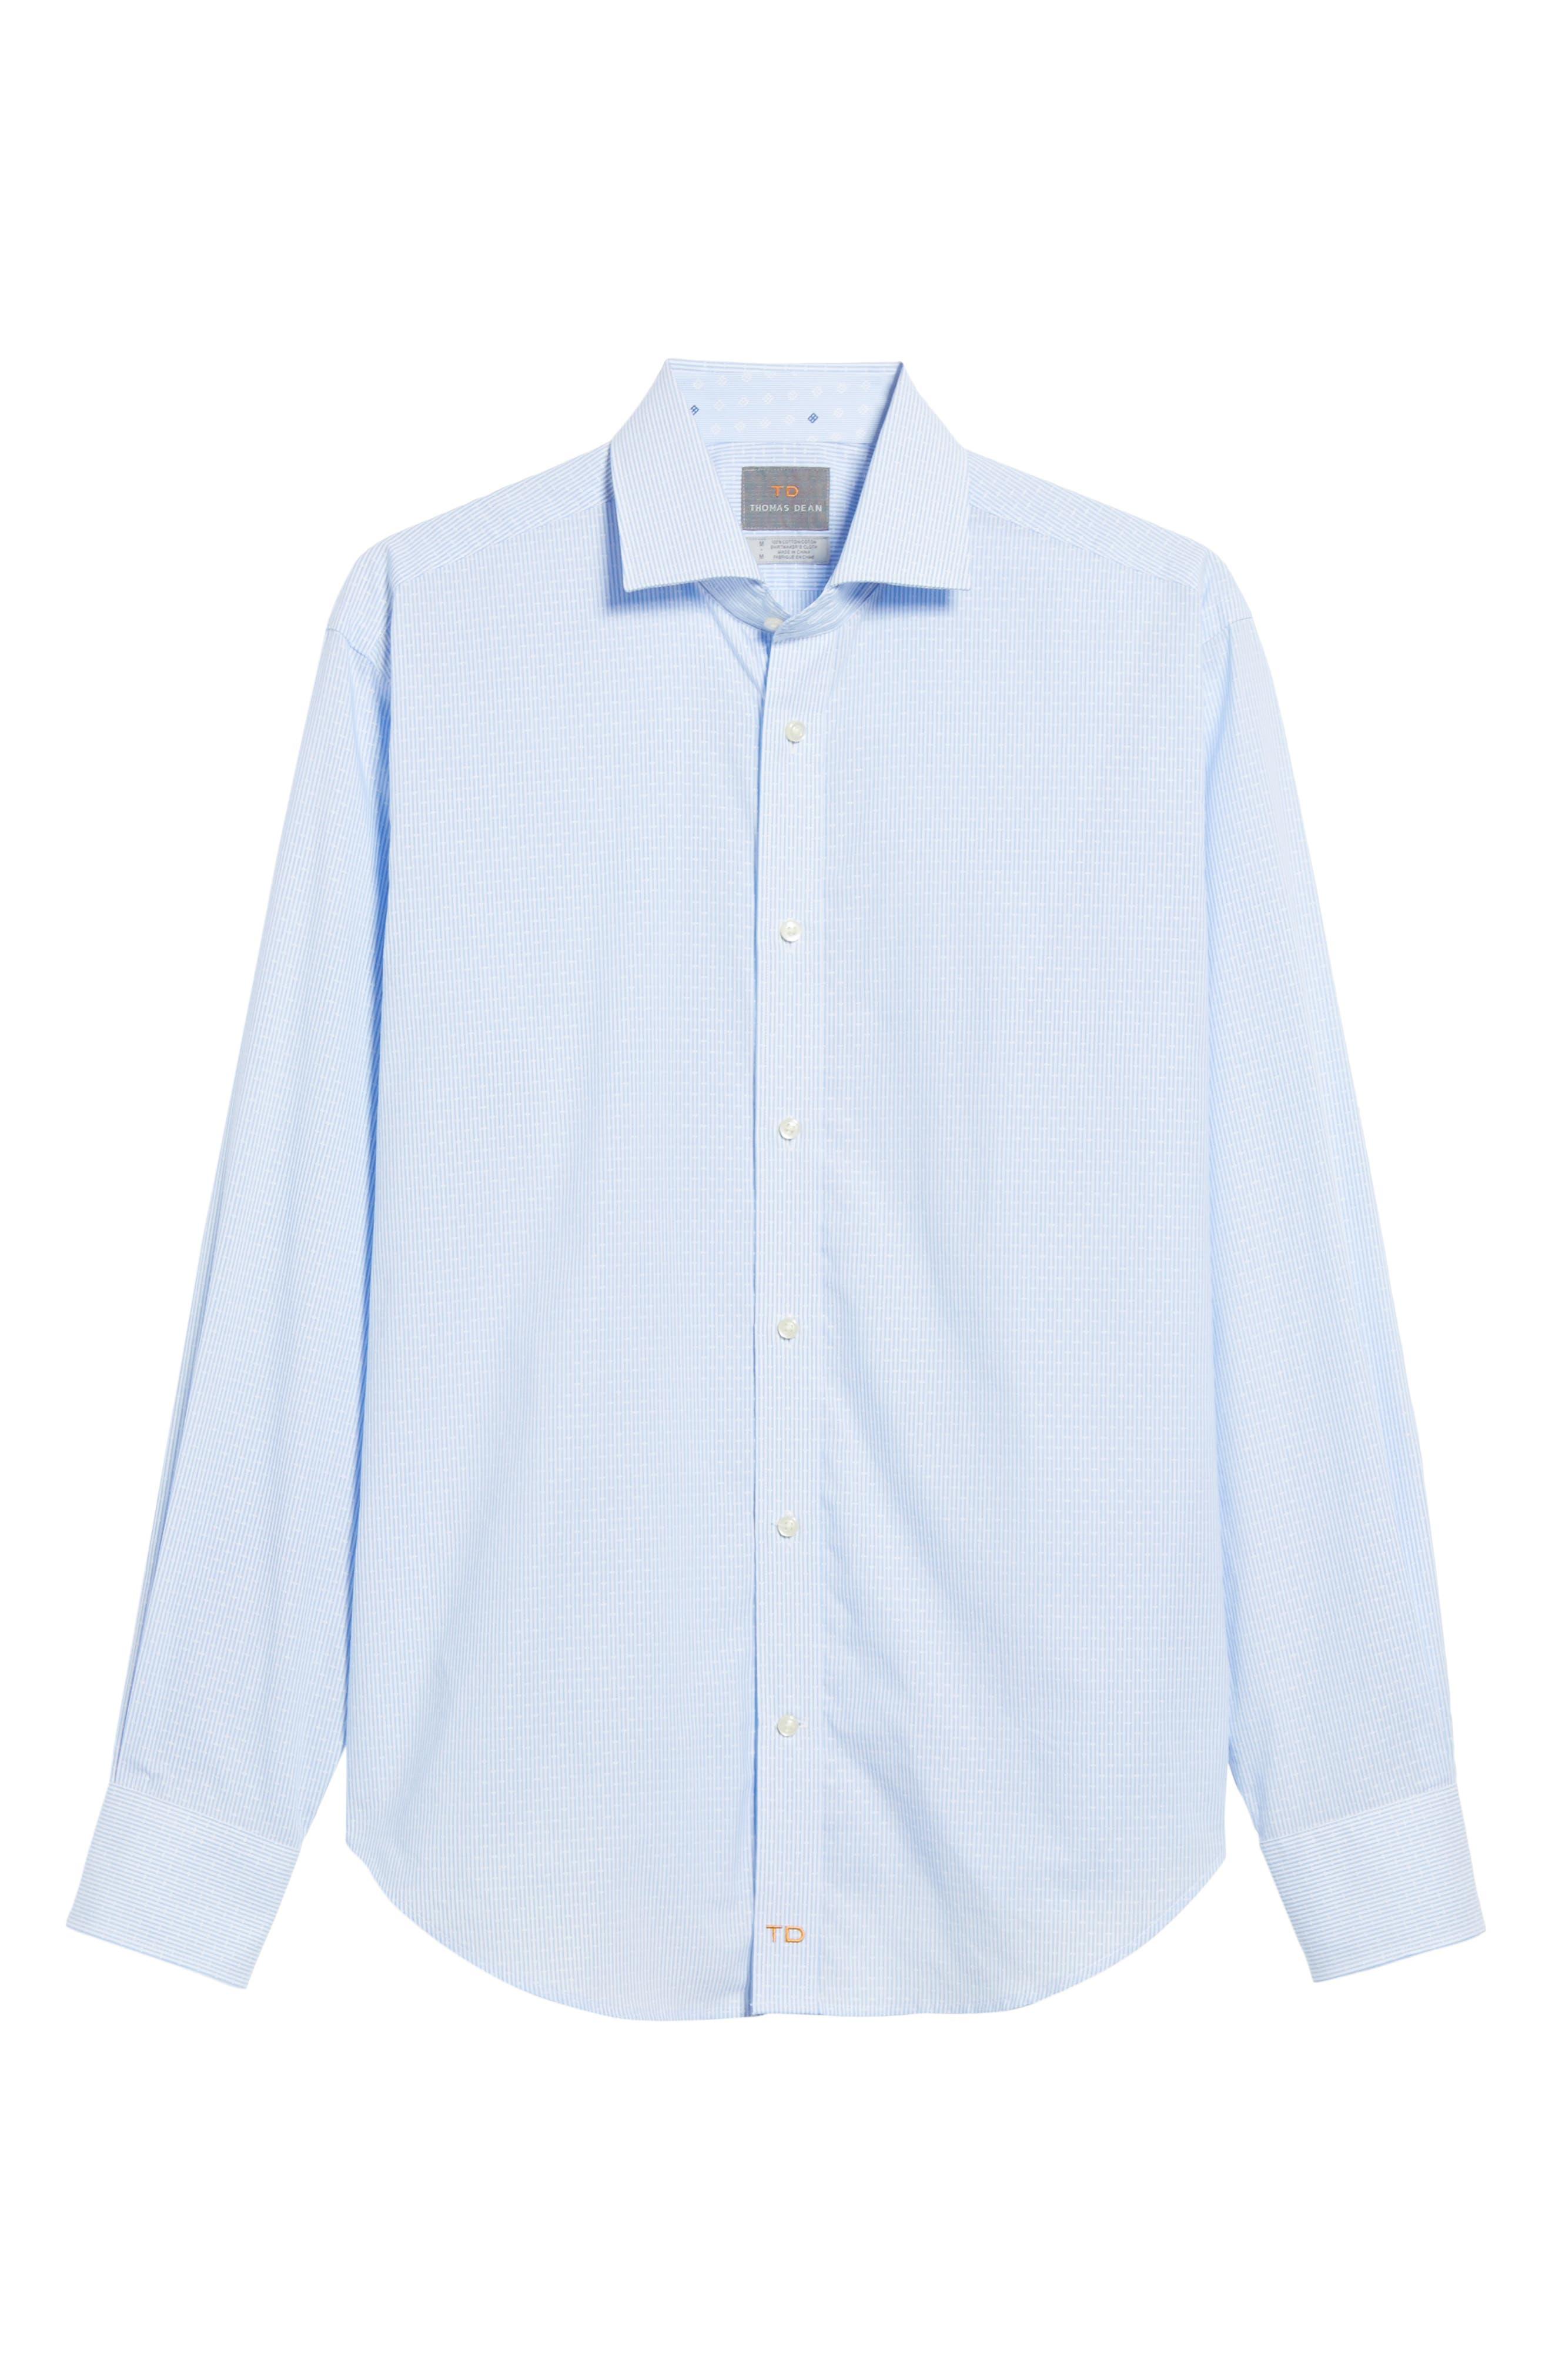 Regular Fit Stripe Sport Shirt,                             Alternate thumbnail 6, color,                             020